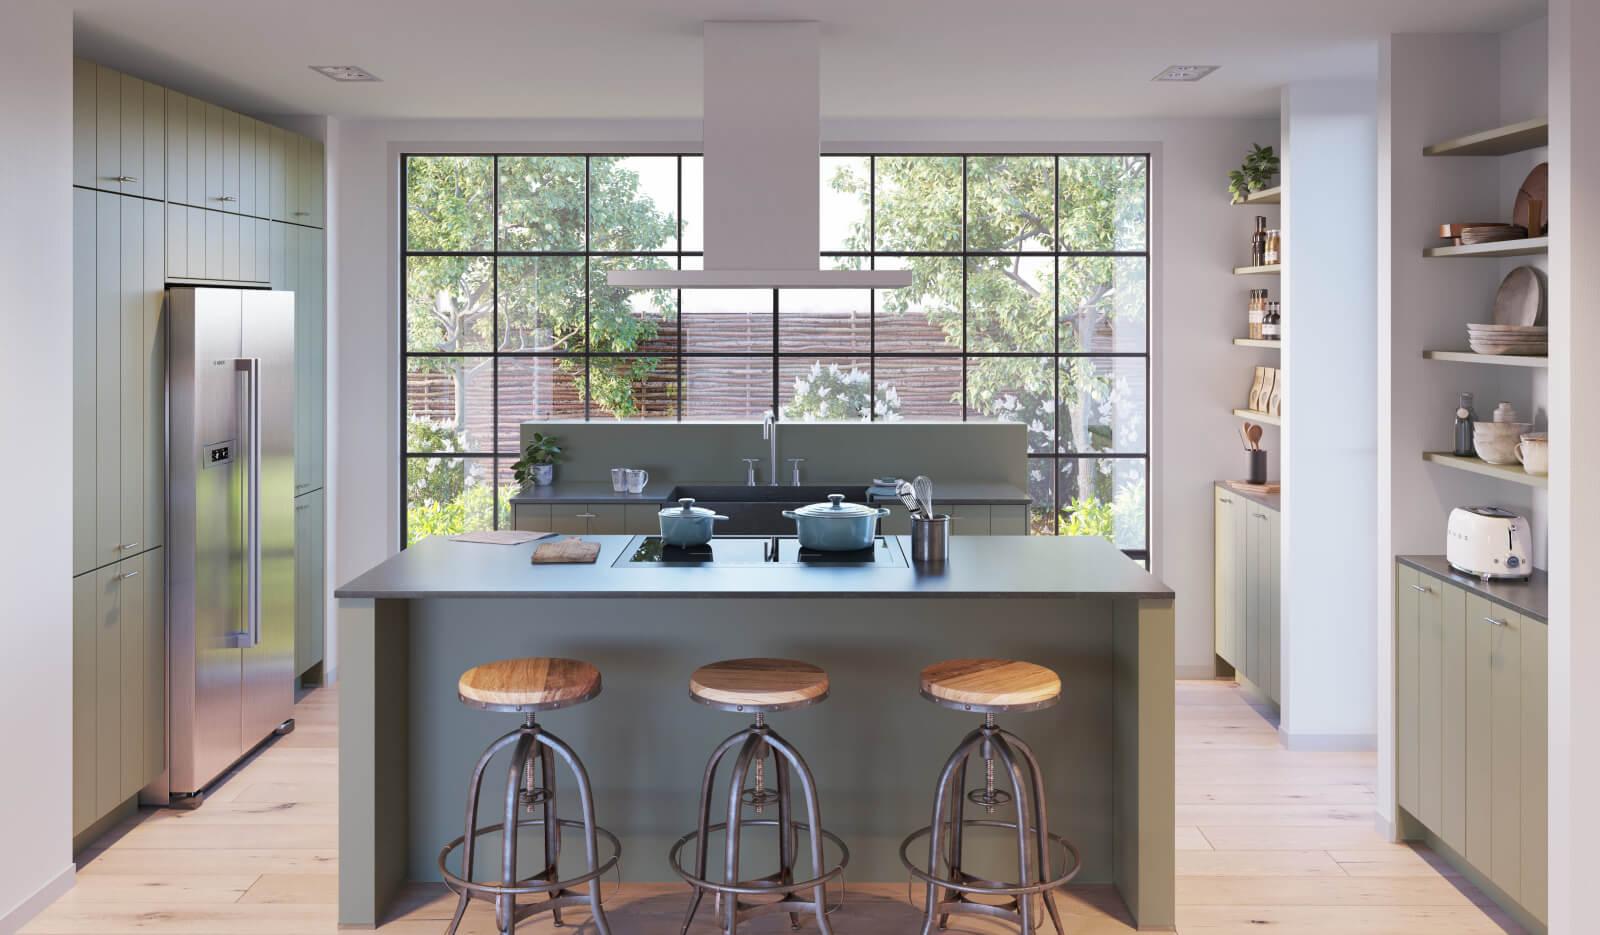 Keuken Olympia Stroken NCS olijfgroen - leefkeuken